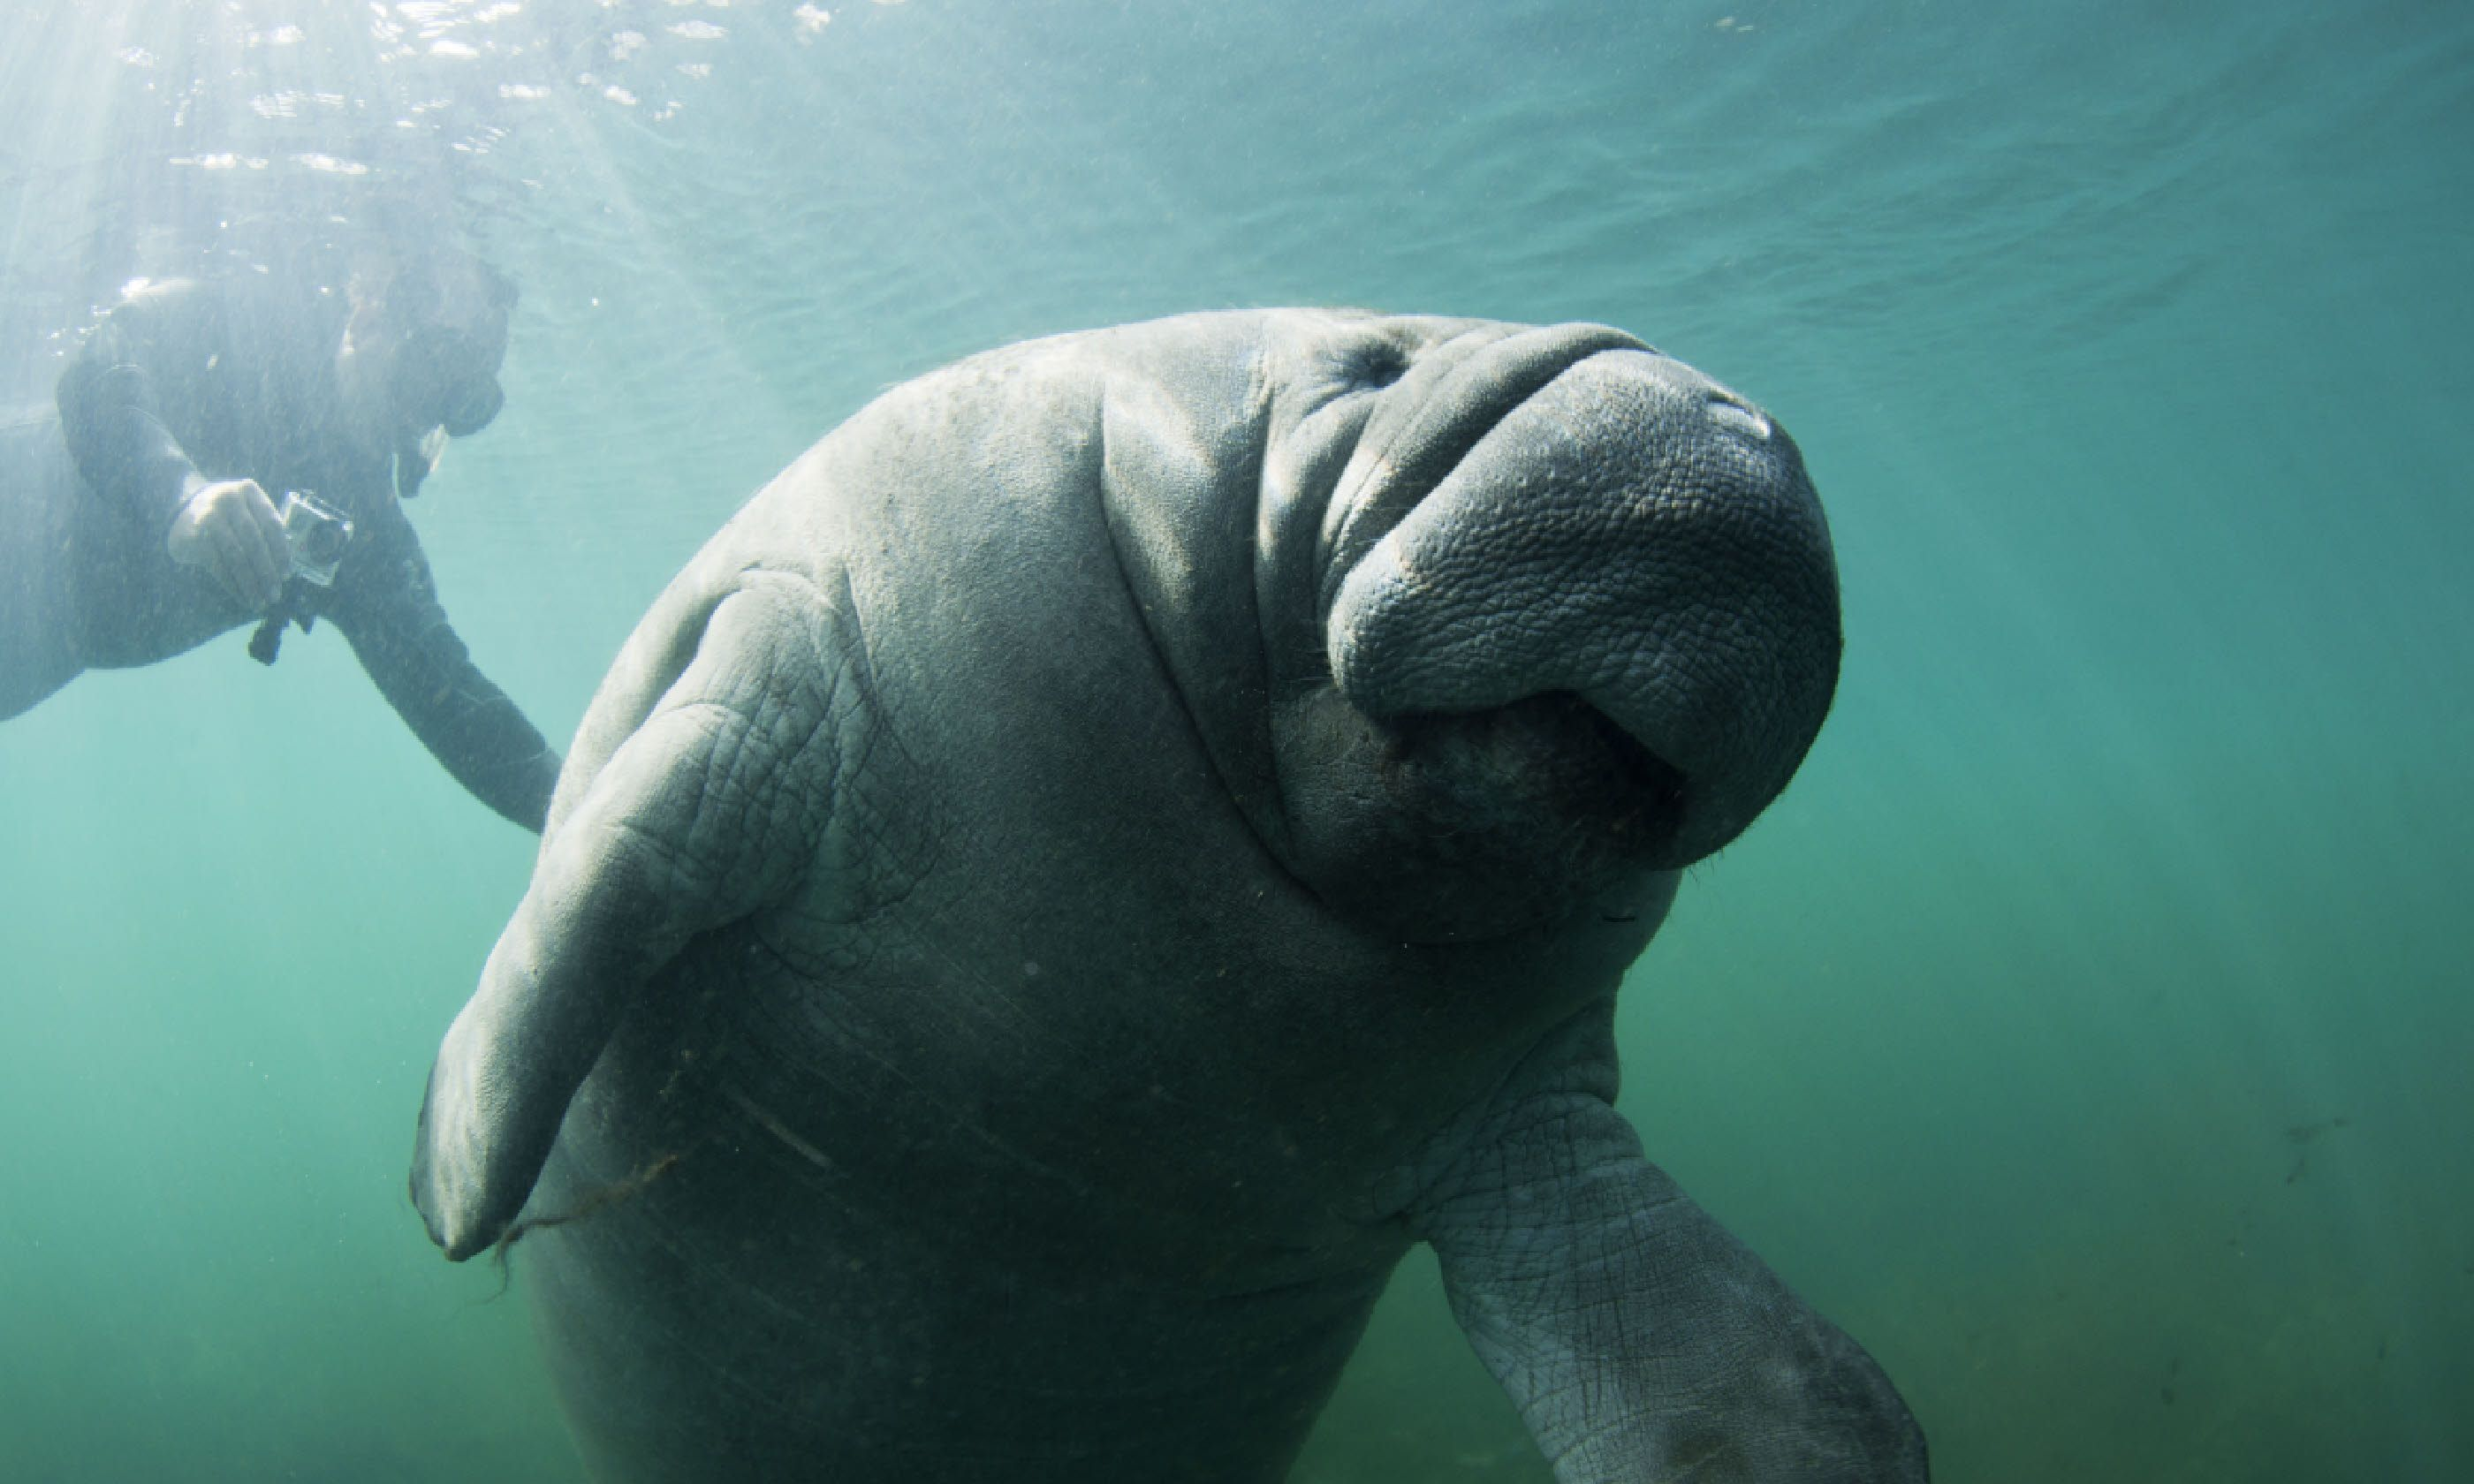 Manatee, Florida (Shutterstock)